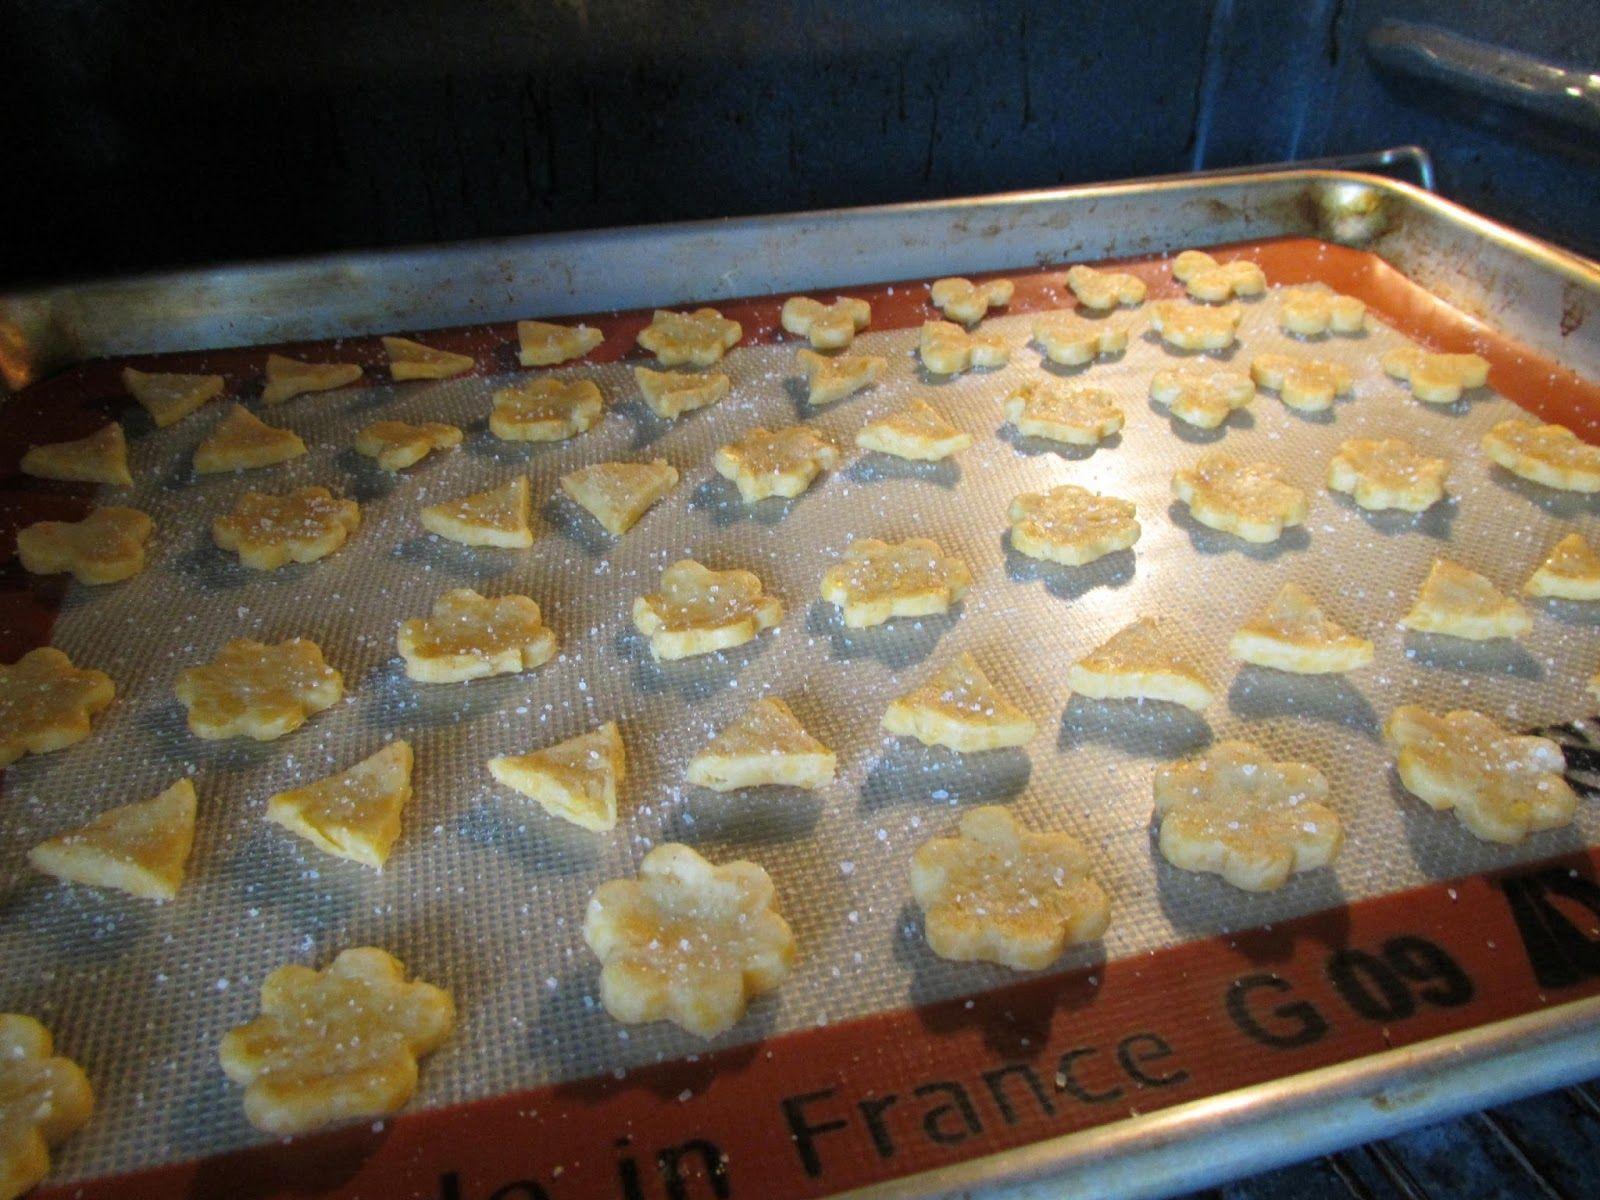 Glutenfree cheezit style crackers gluten free